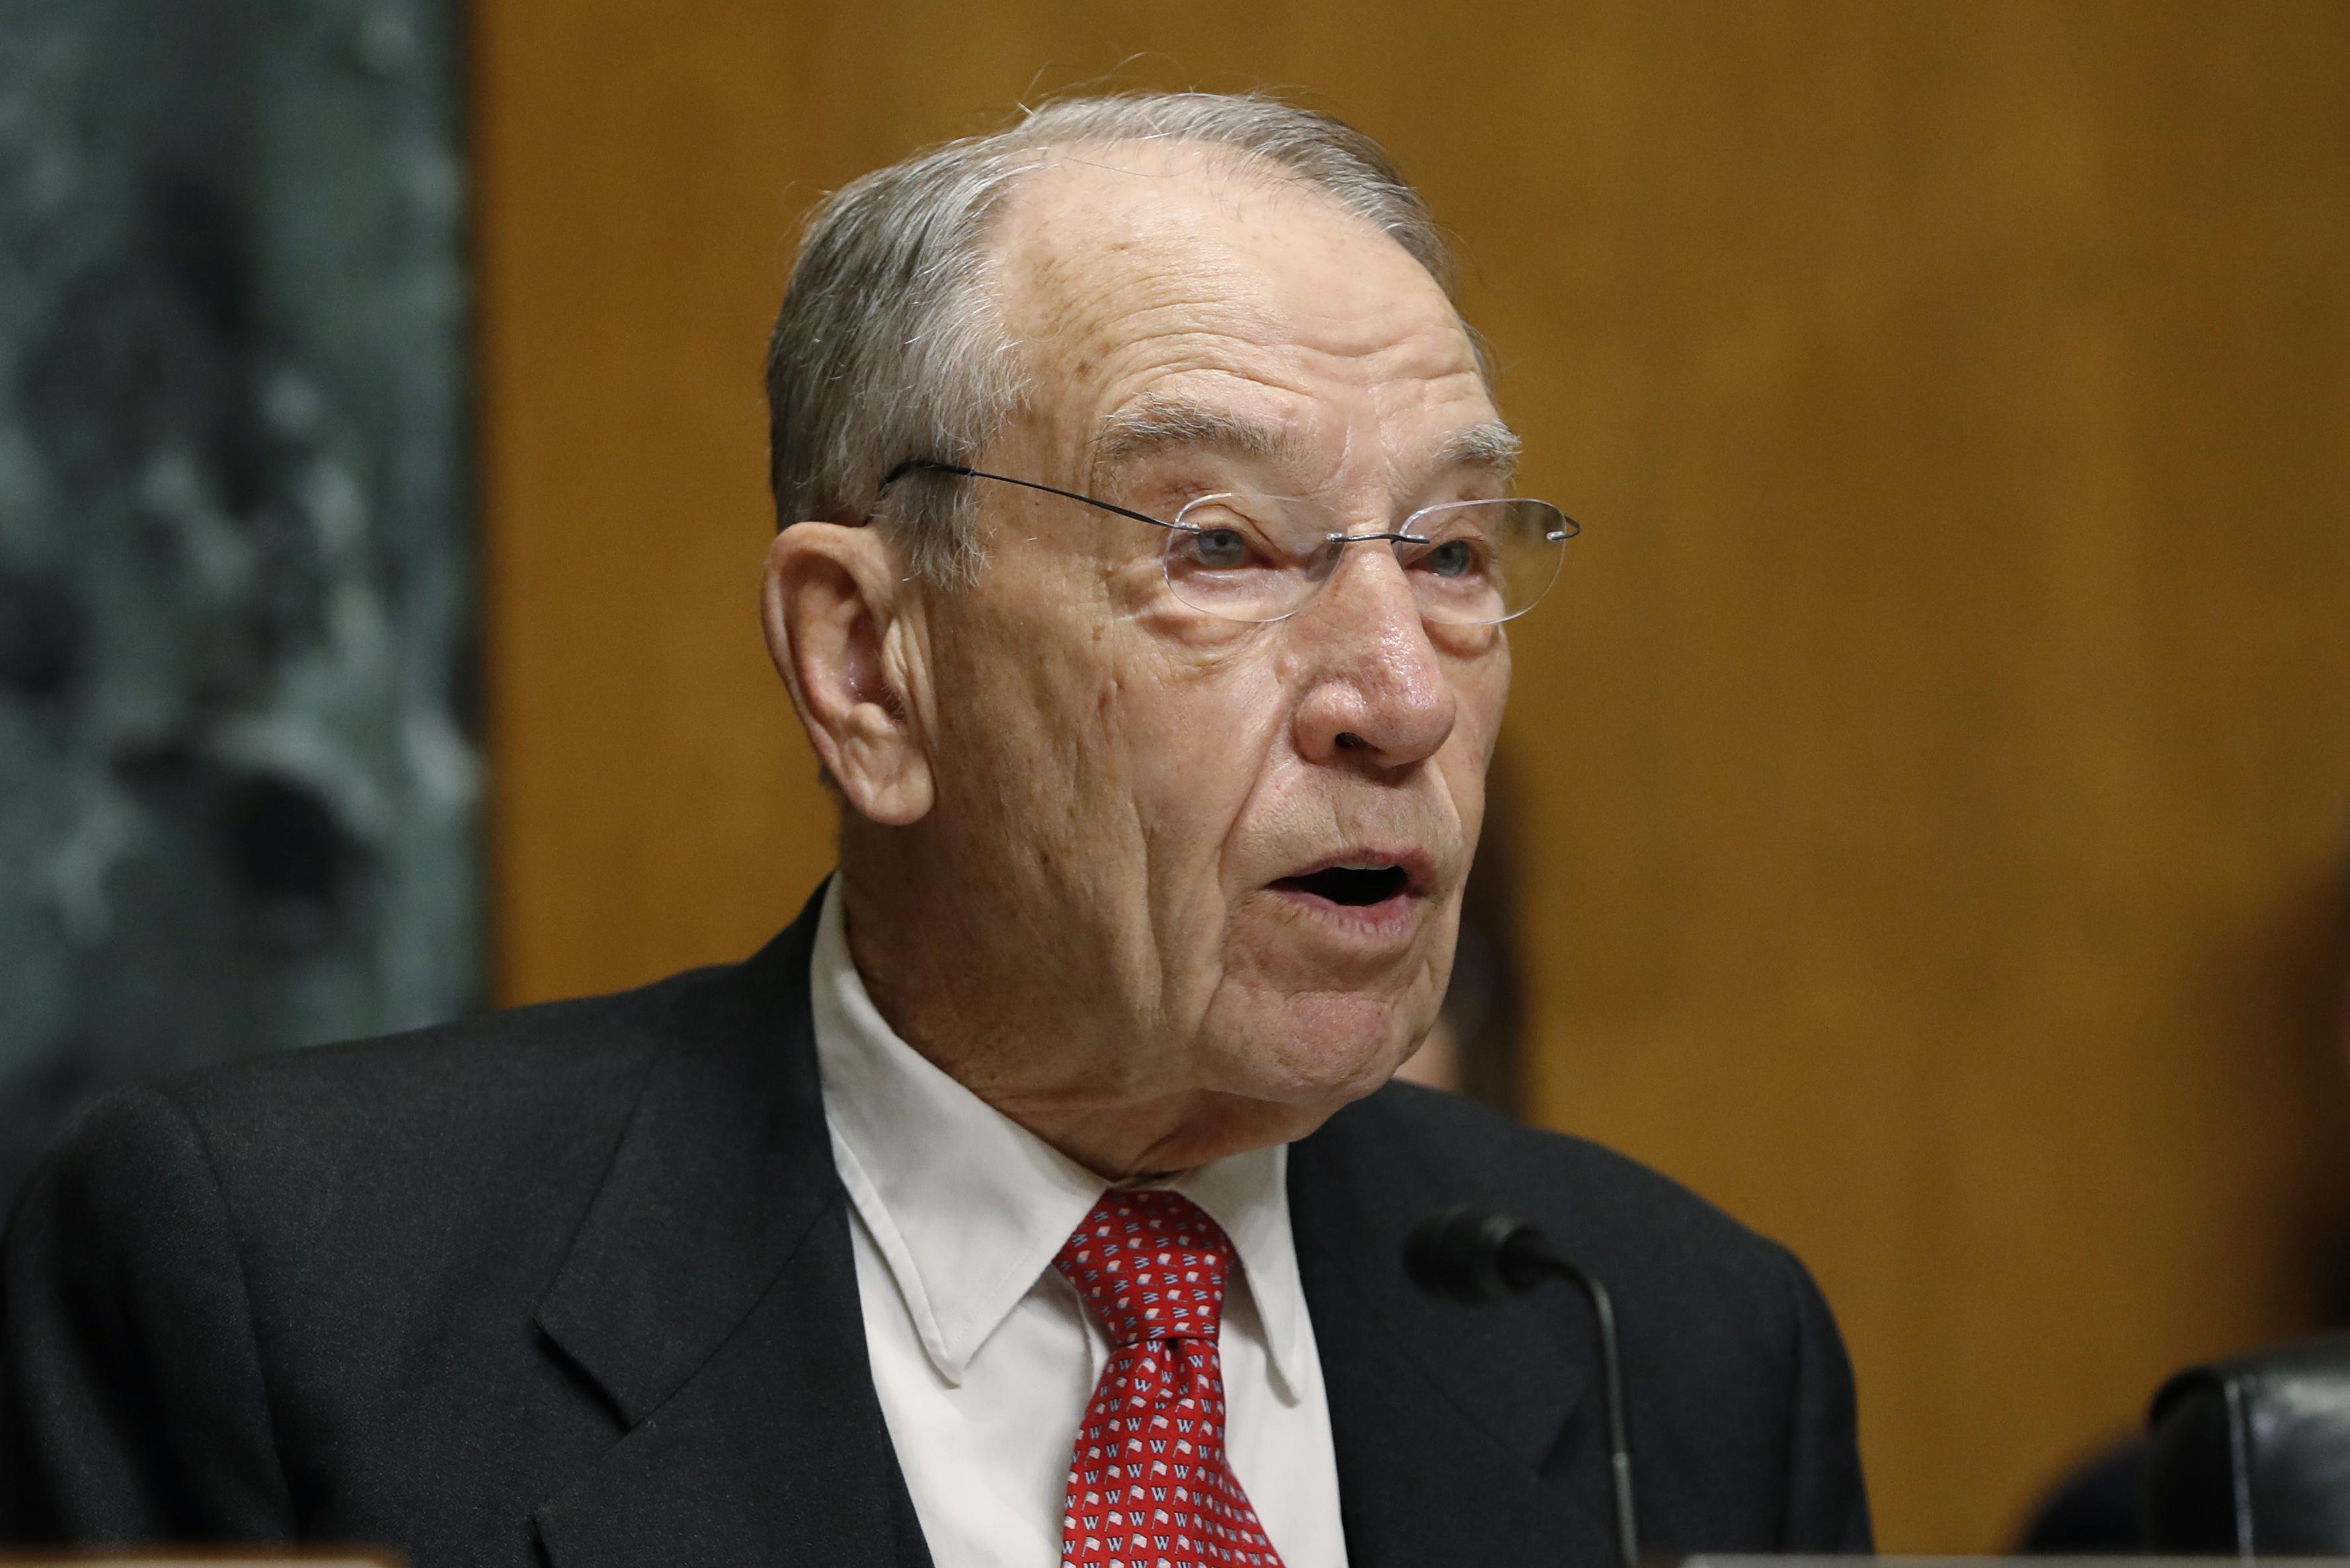 Trump backs Senate drug-pricing bill, pressuring wary Republicans